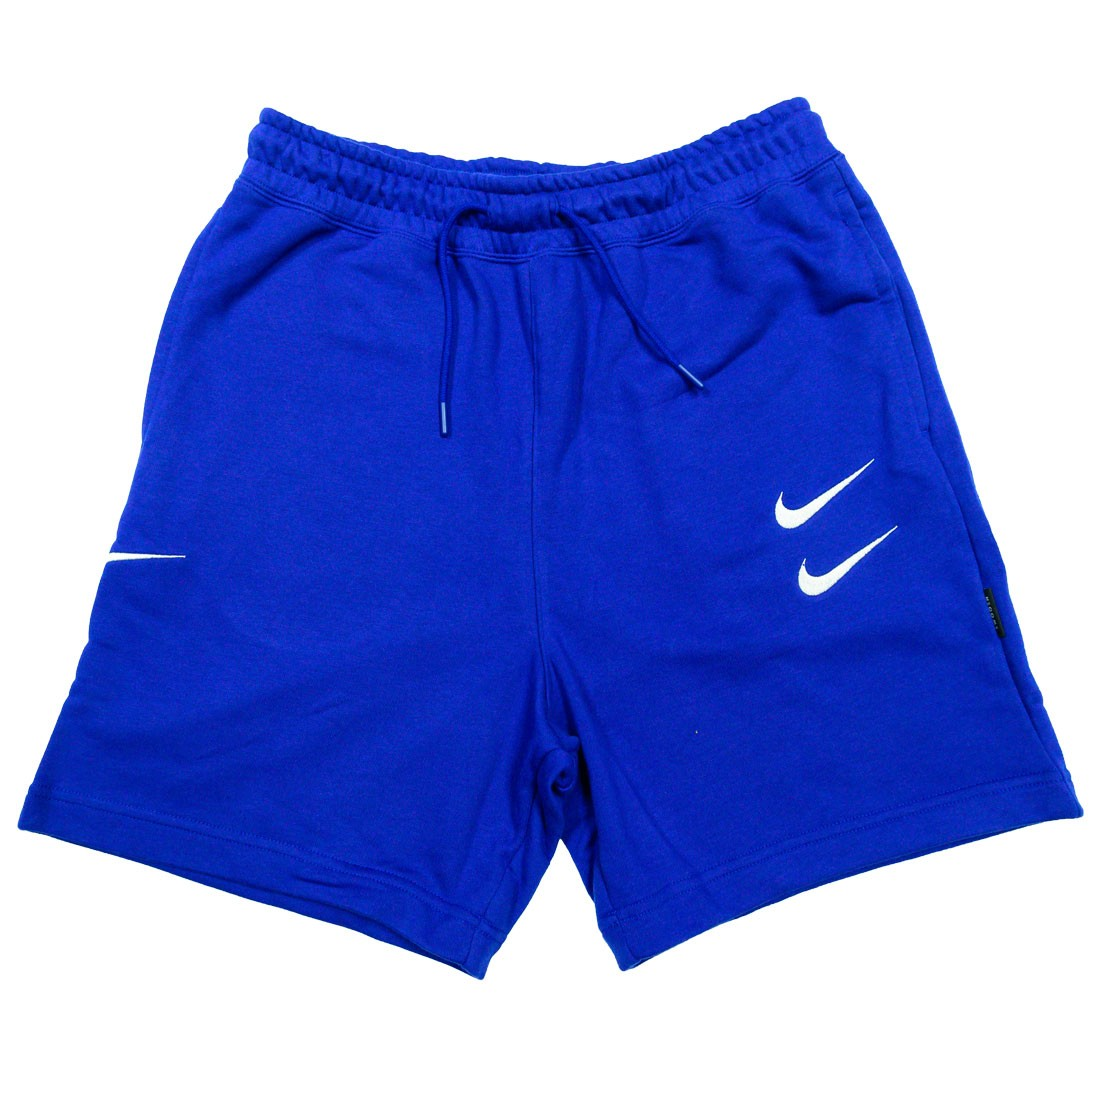 Nike Men Sportswear Swoosh Shorts (deep royal blue / white)